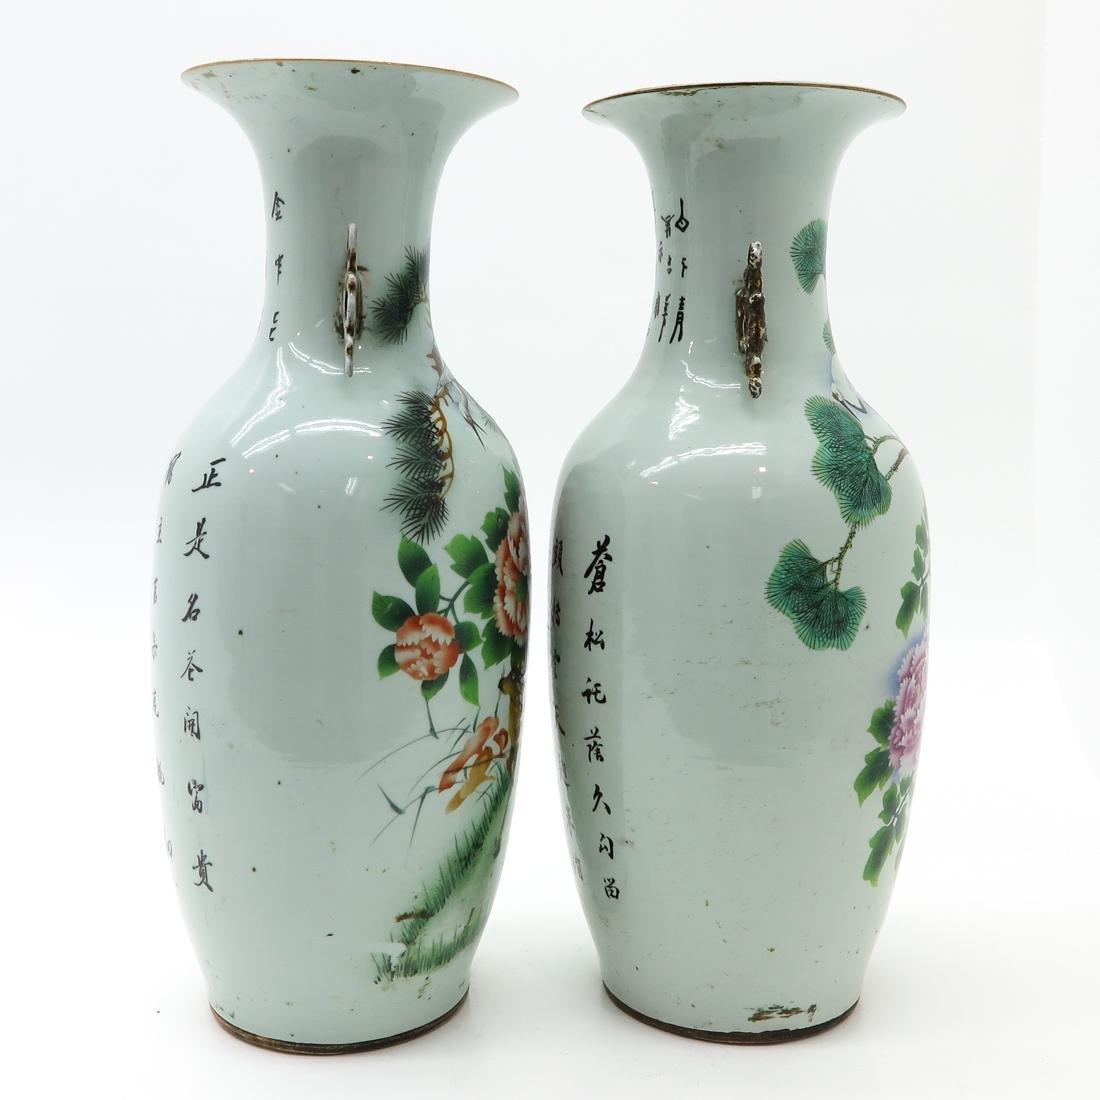 Lot of 2 Vases - 4